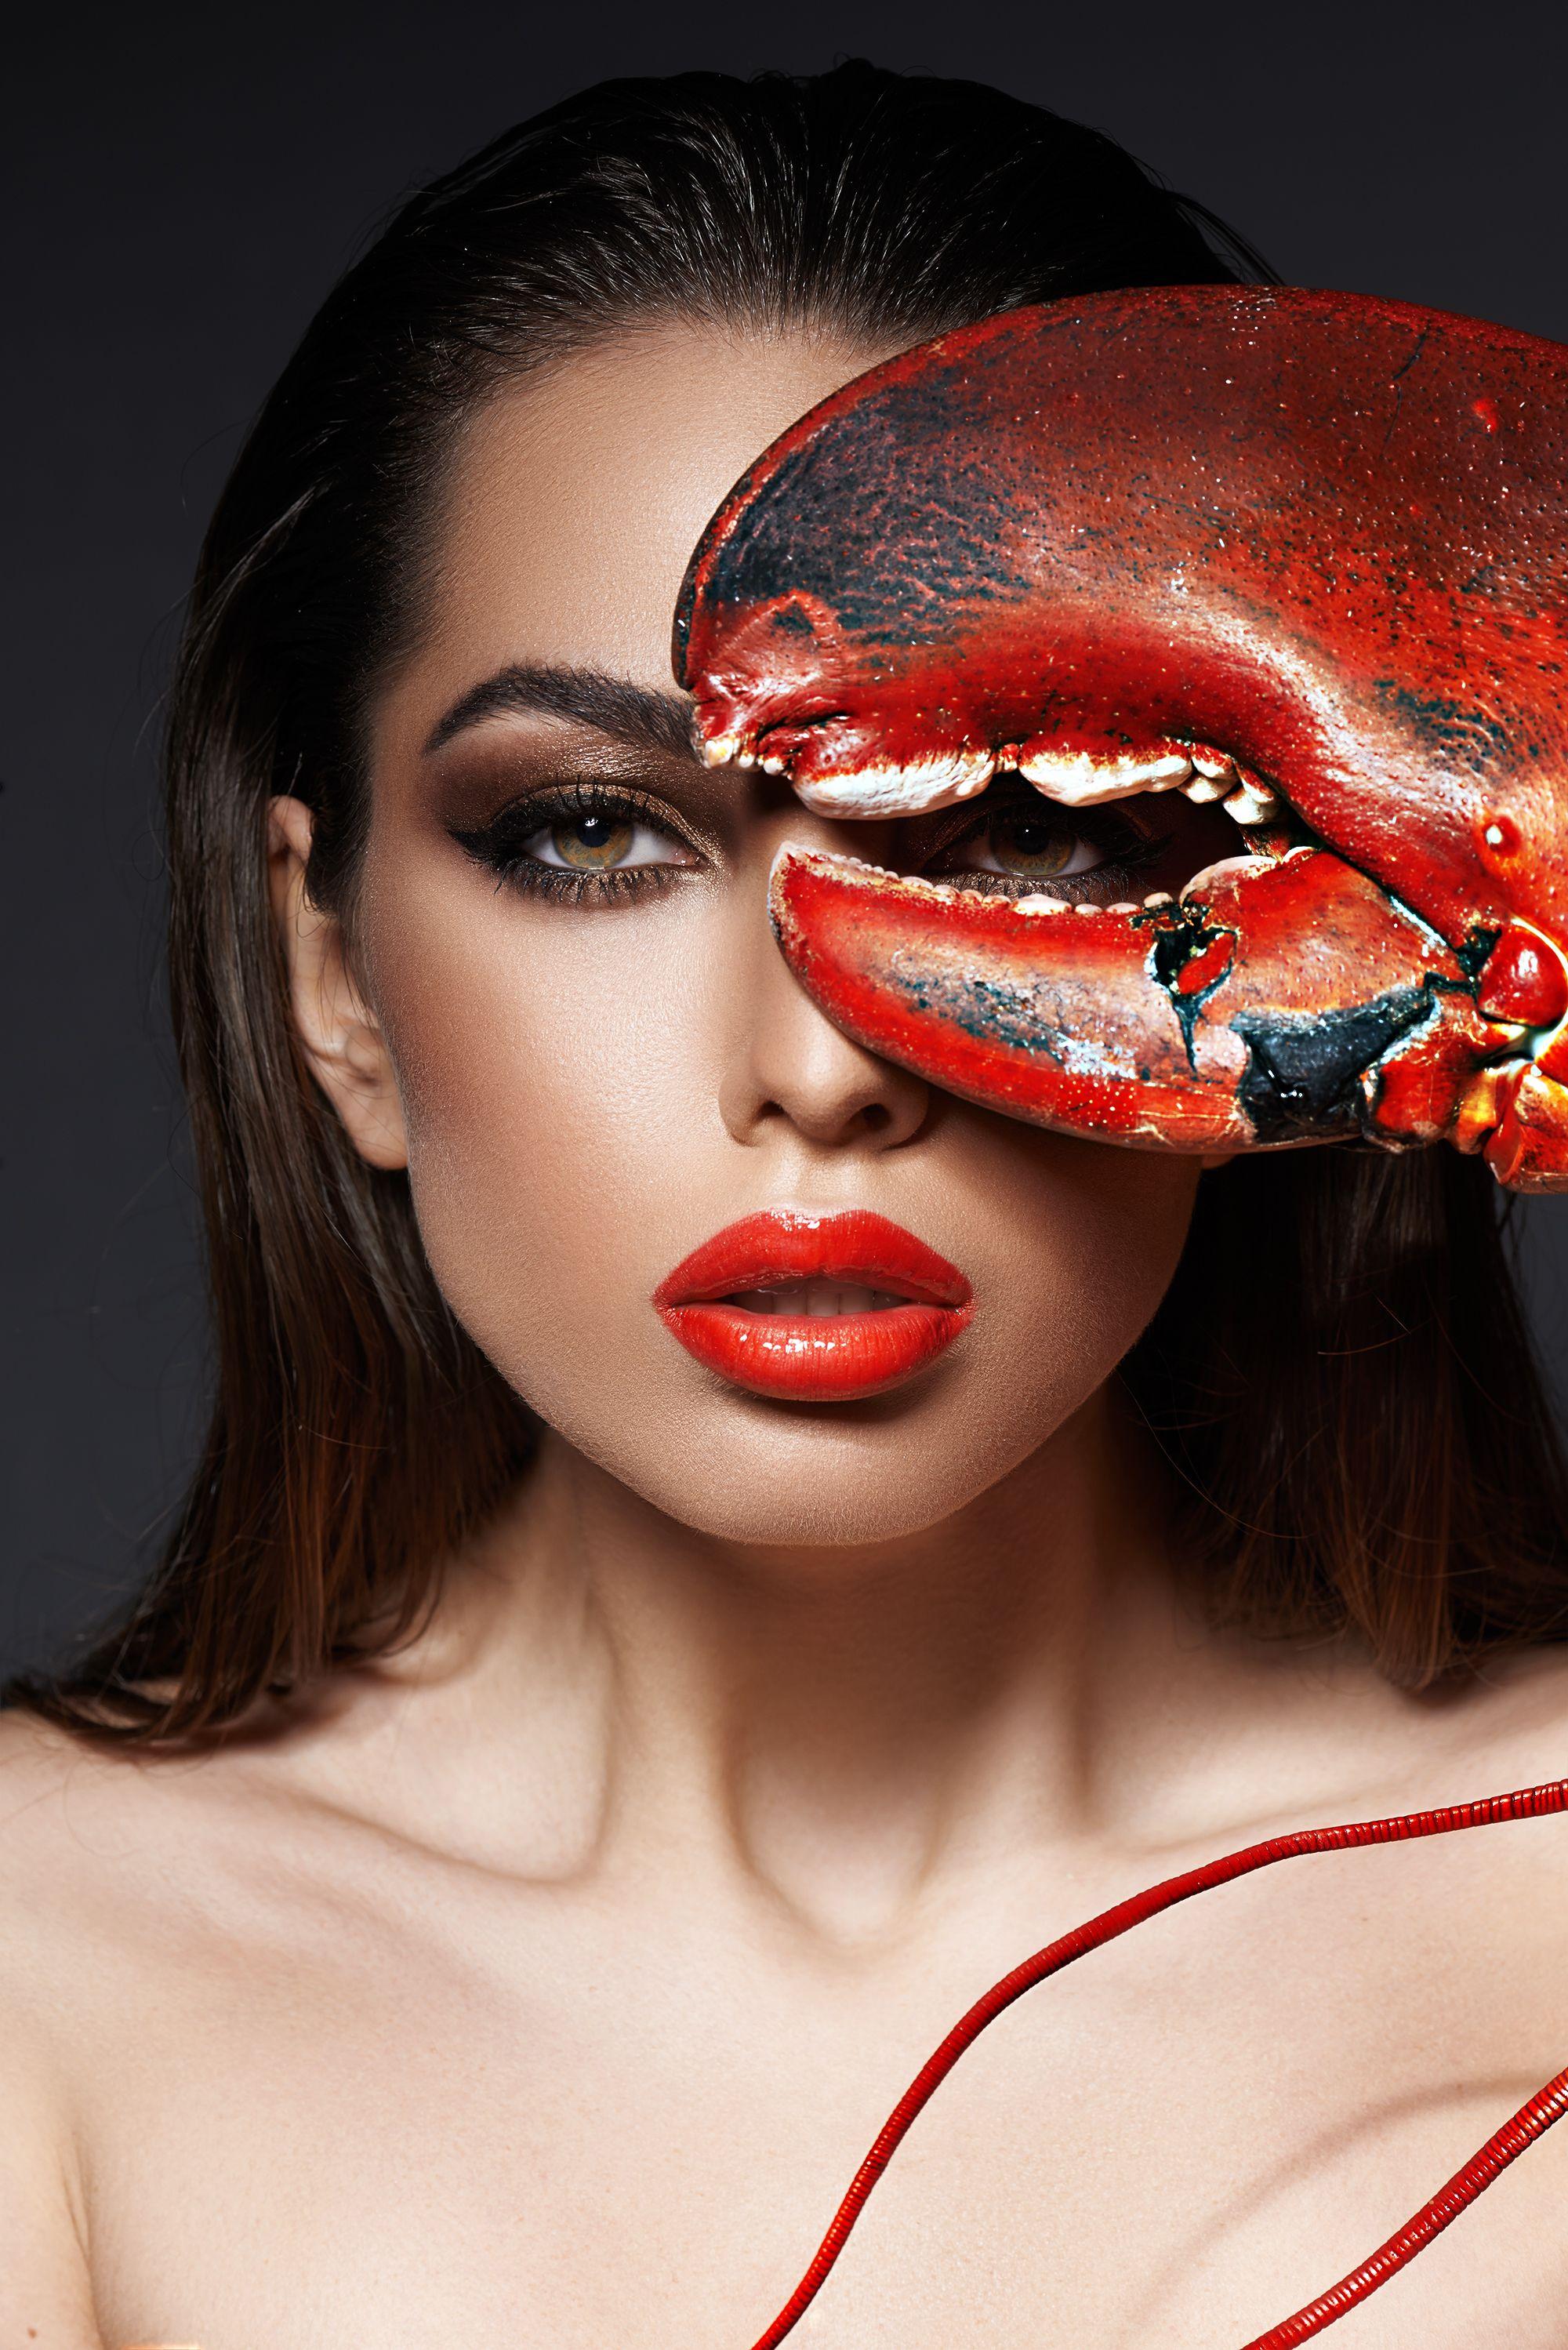 Girls&Food on Behance Halloween face makeup, Girl, Makeup